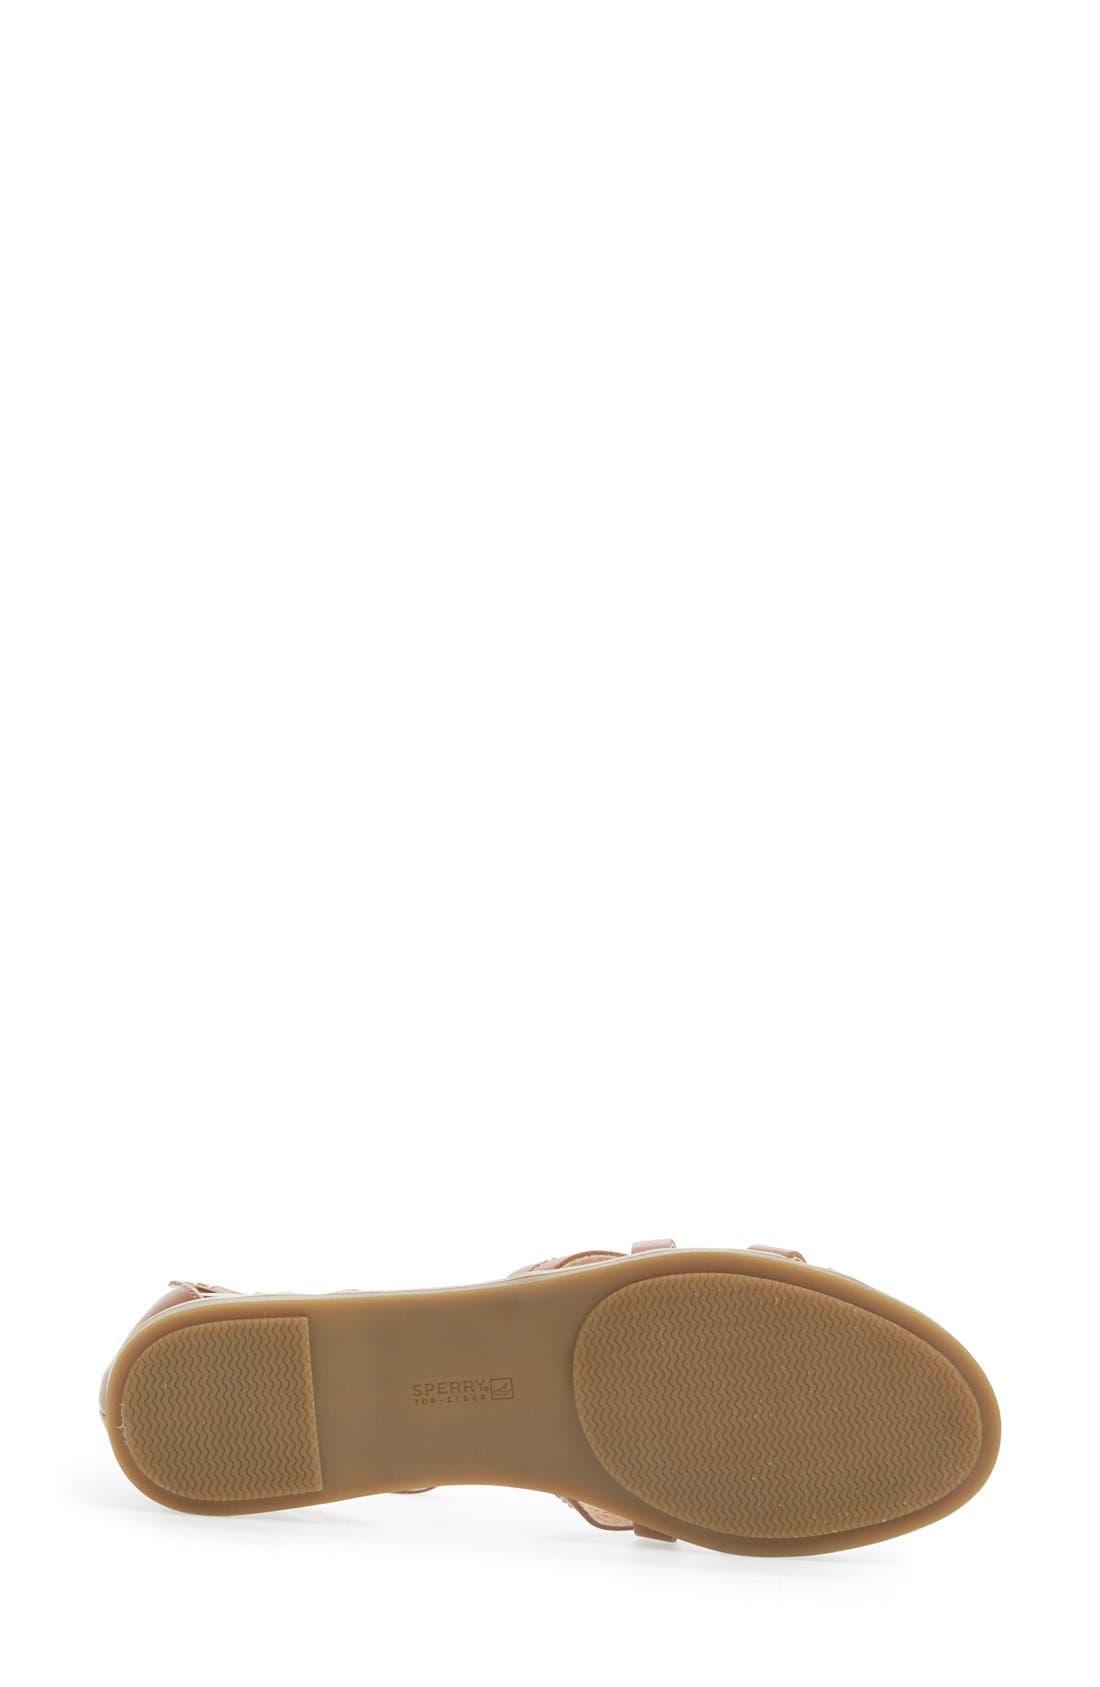 Alternate Image 4  - Sperry 'June' Leather Ankle Strap Sandal (Women)